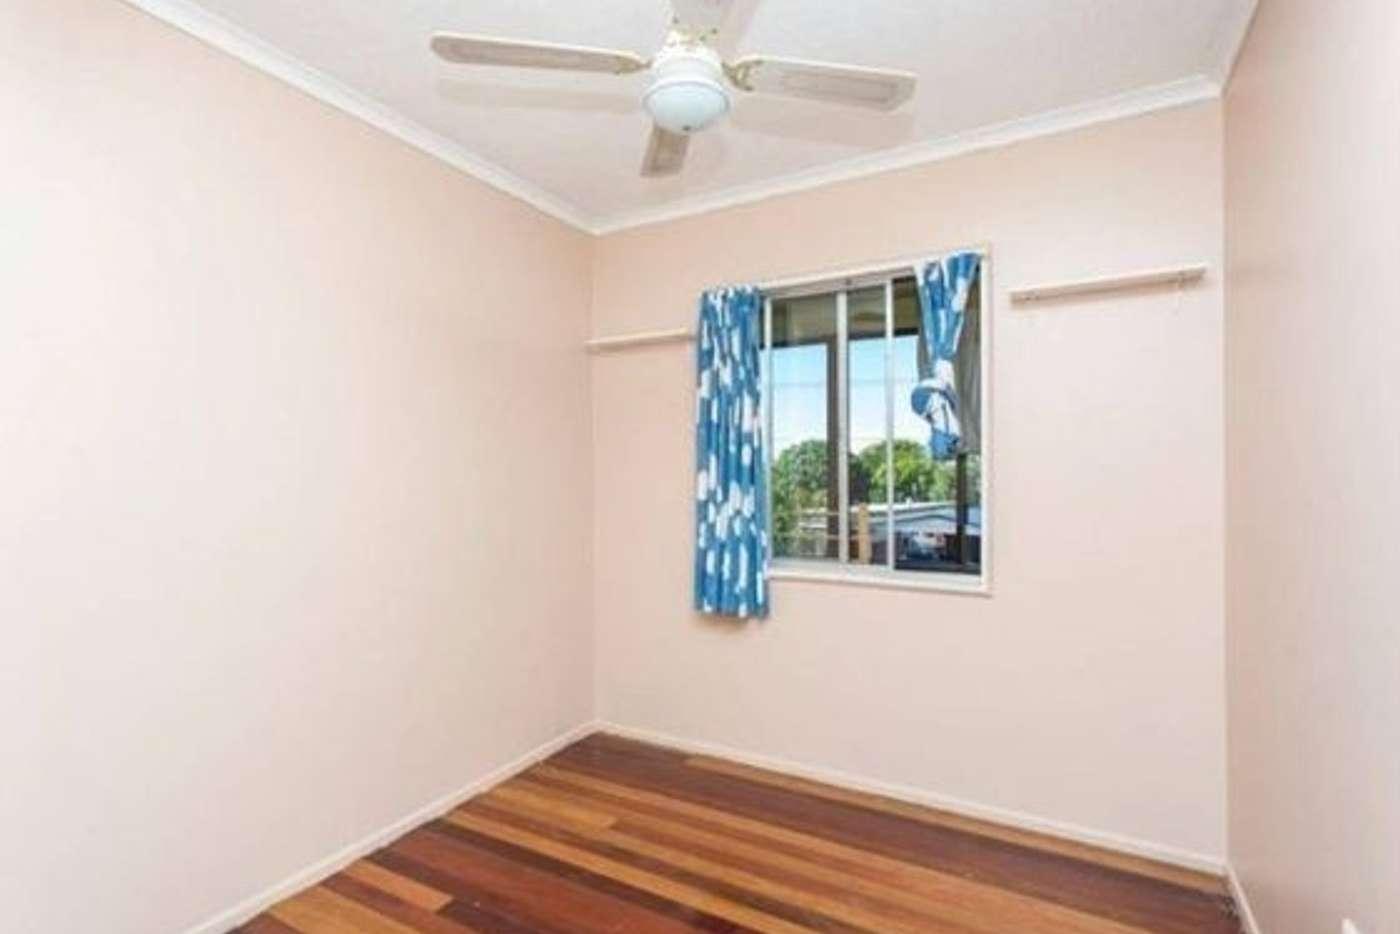 Seventh view of Homely house listing, 25 Macfarlane Street, Kippa-ring QLD 4021